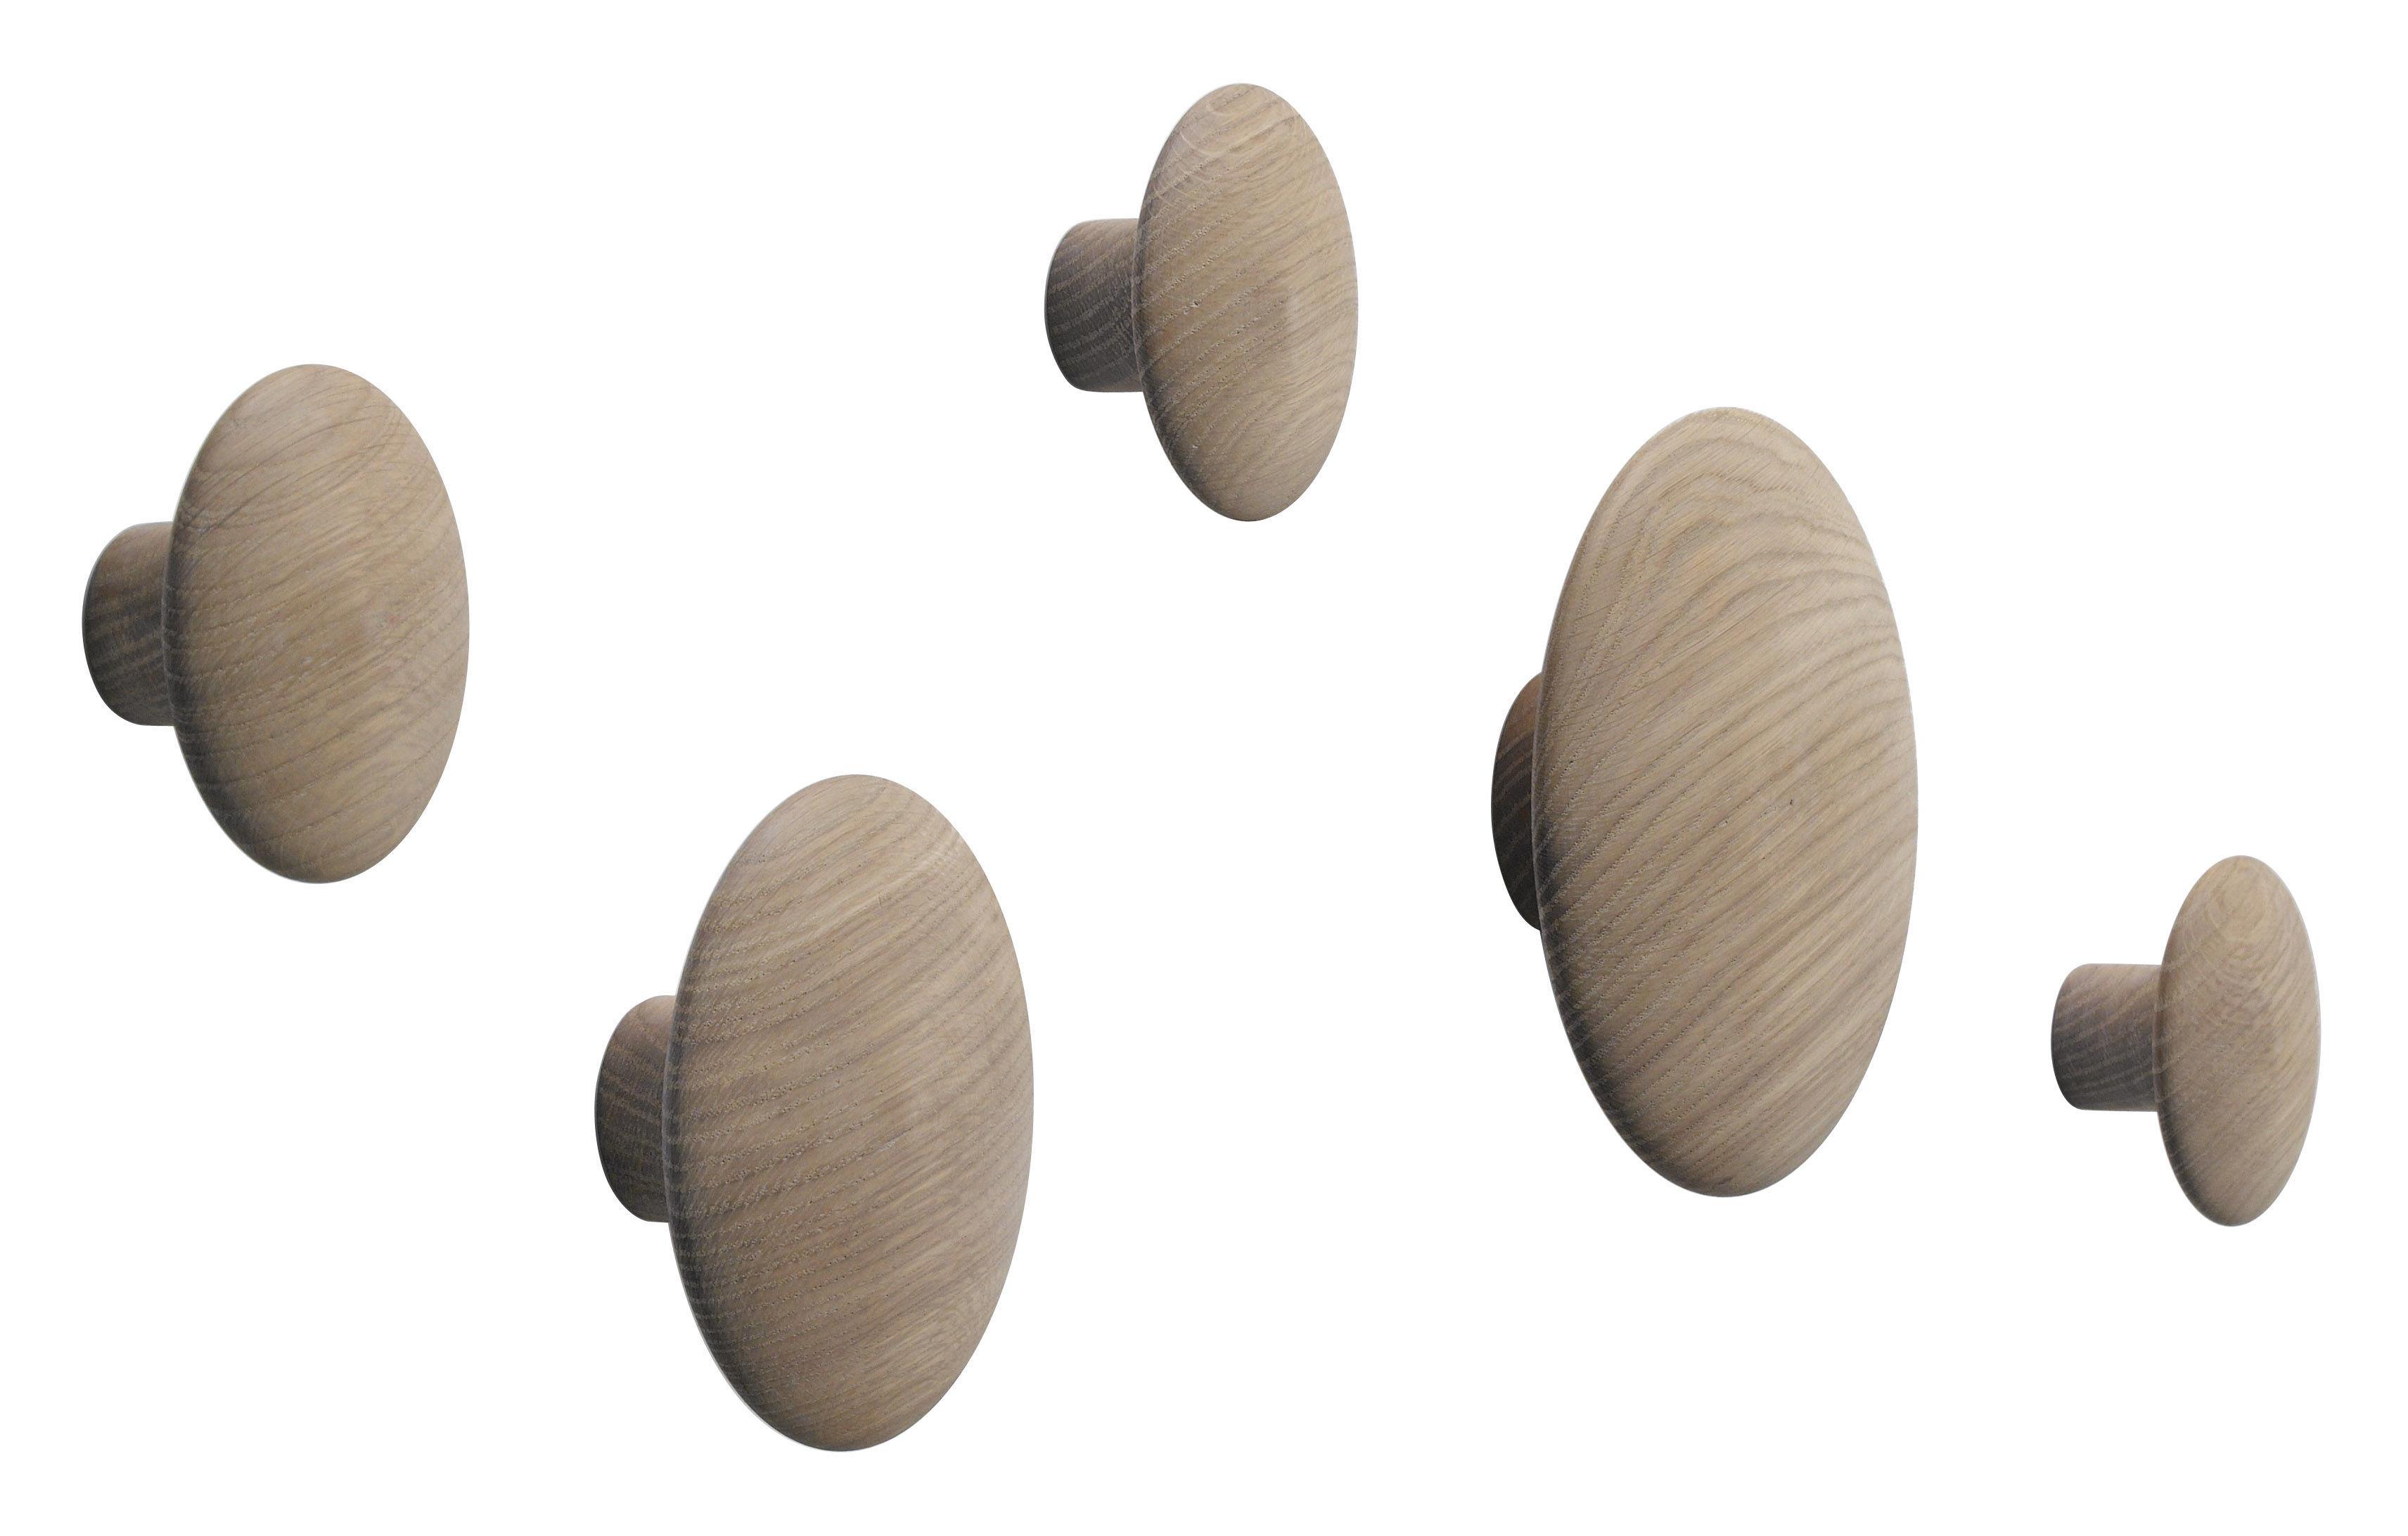 Furniture - Coat Racks & Pegs - The dots Hook - / Set of 5 by Muuto - Natural oak - Oak